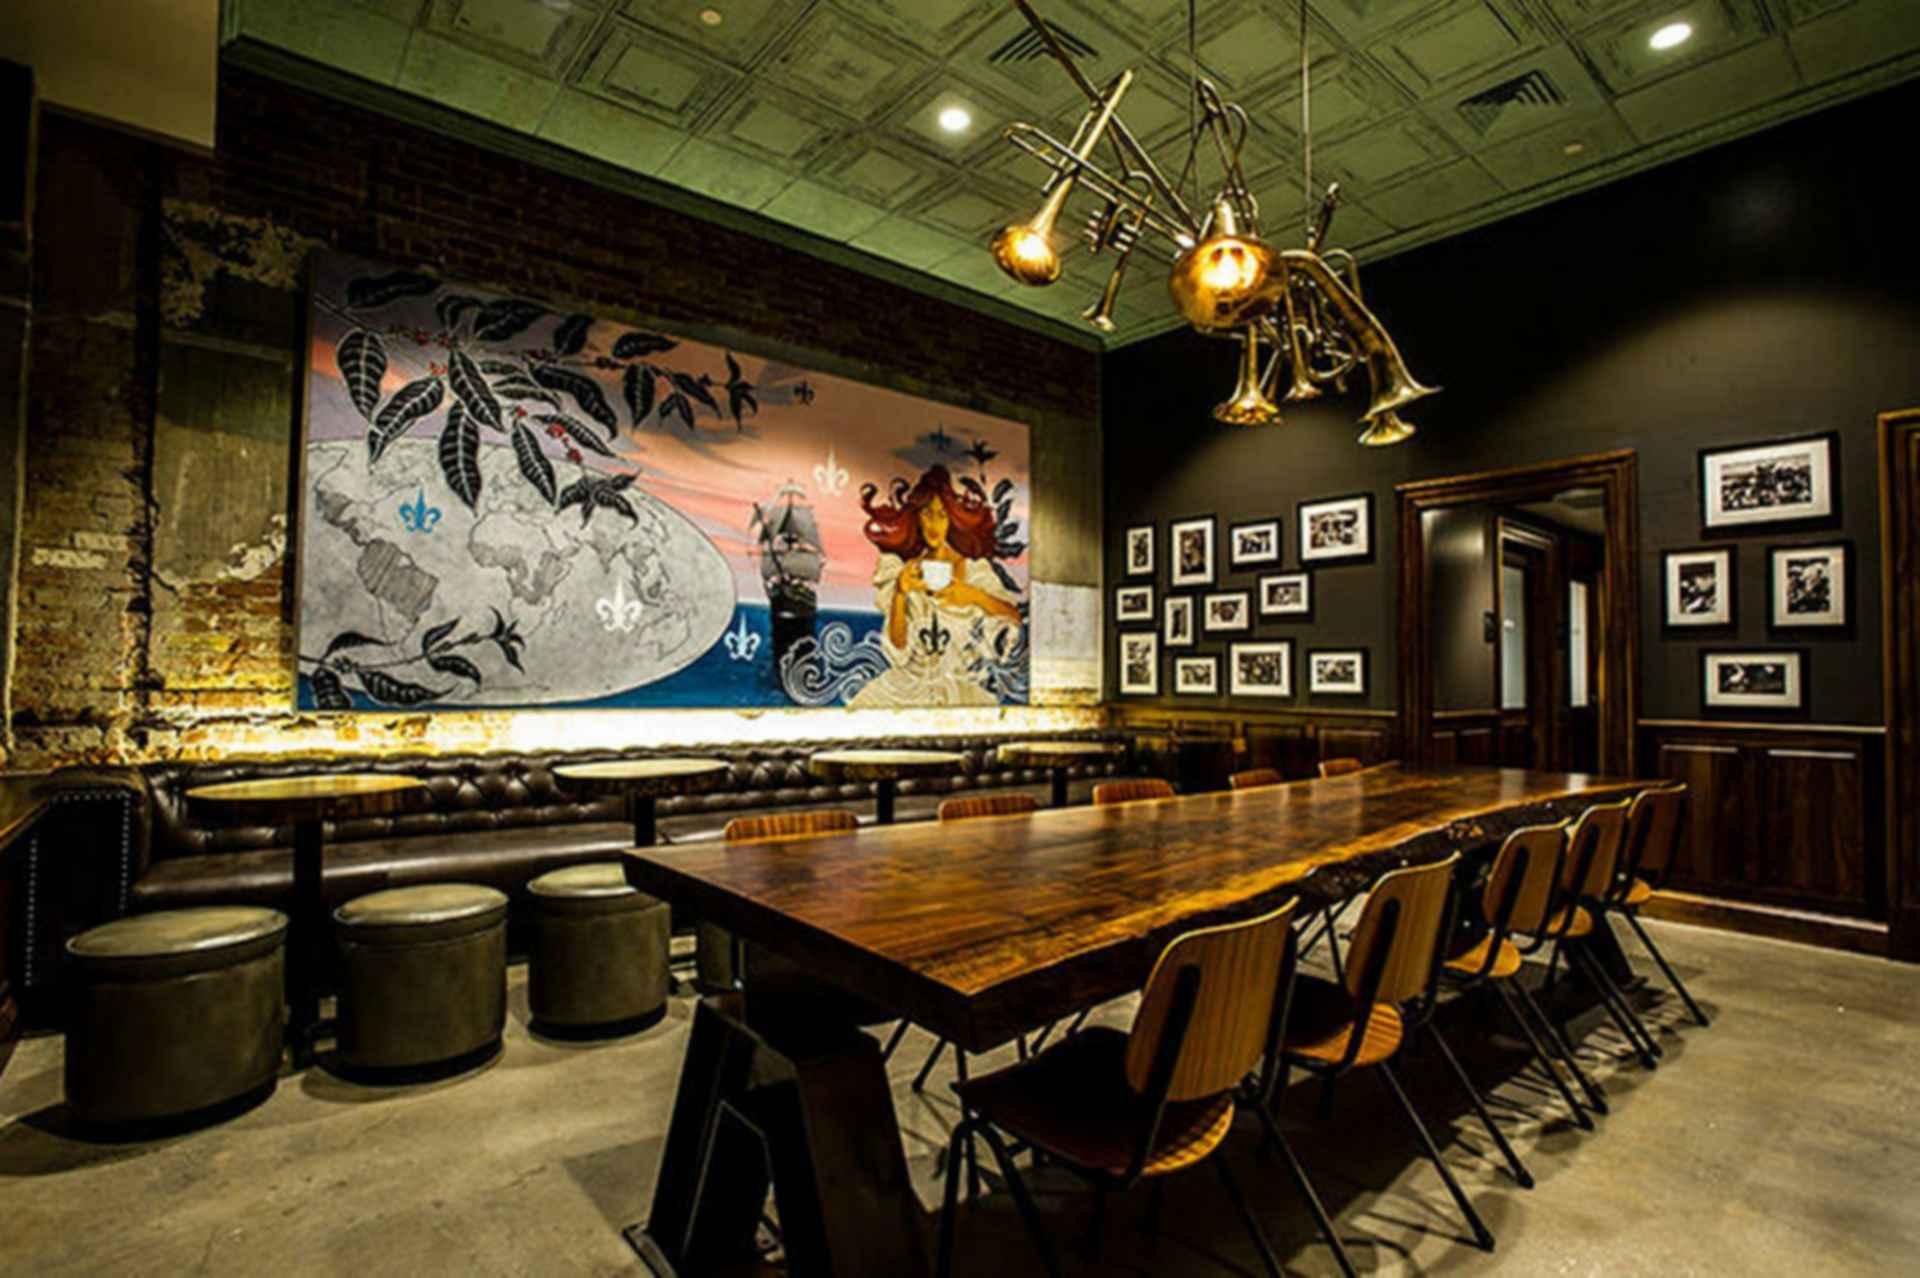 New Orleans Starbucks - Interior